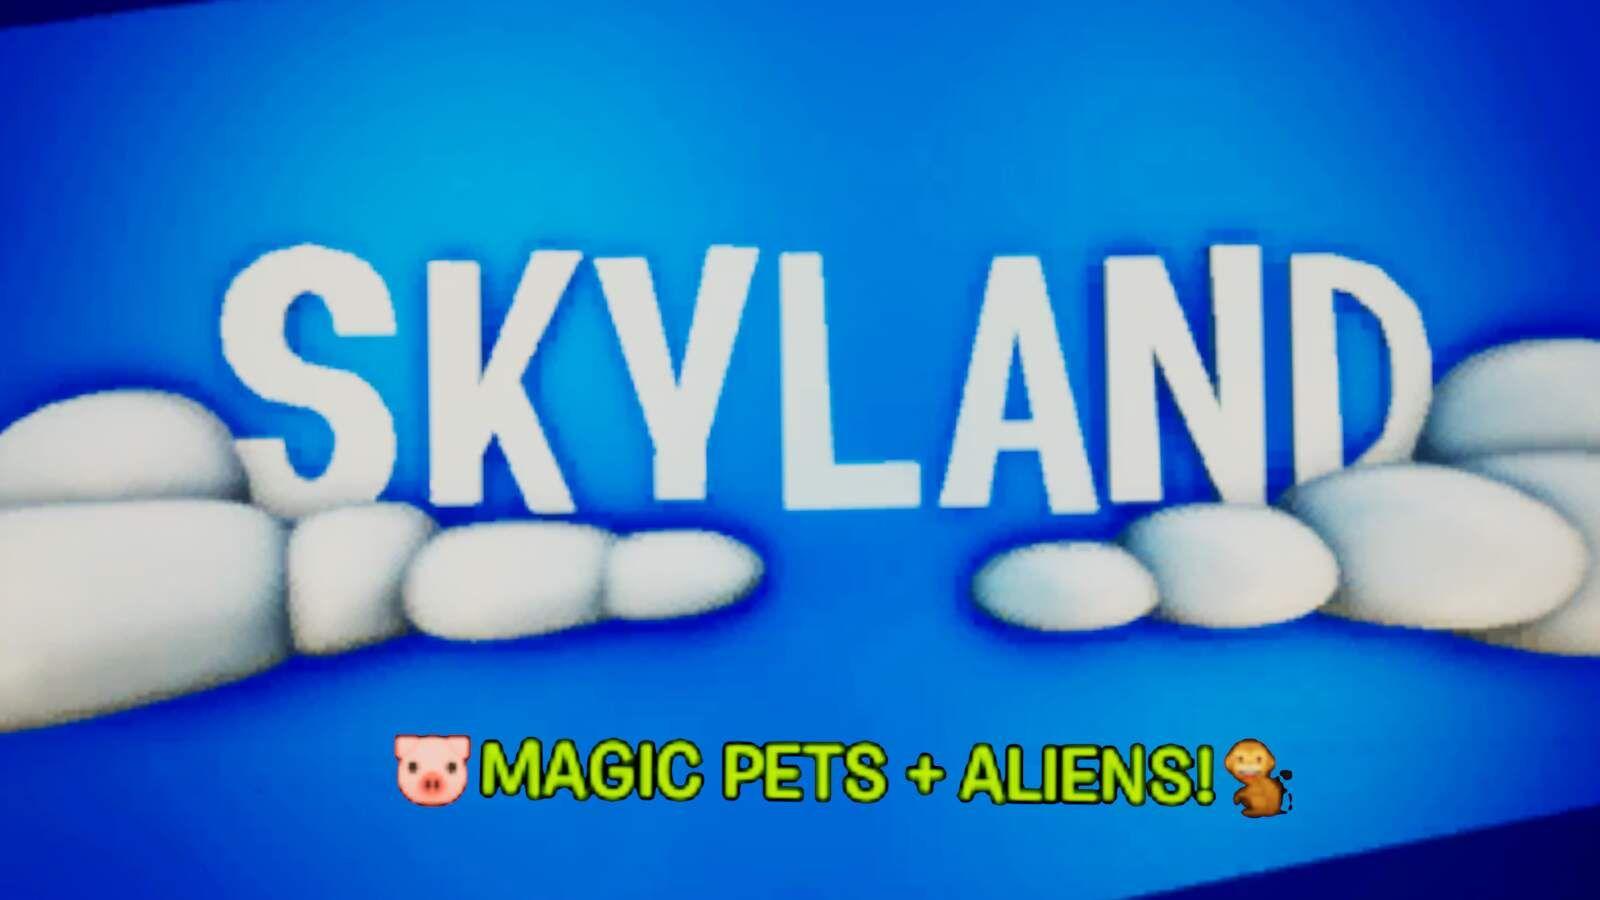 SKYLAND  🐕🐢(MAGIC PETS & ALIENS!)🛸👾 0104-1200-3125 by brendannnd